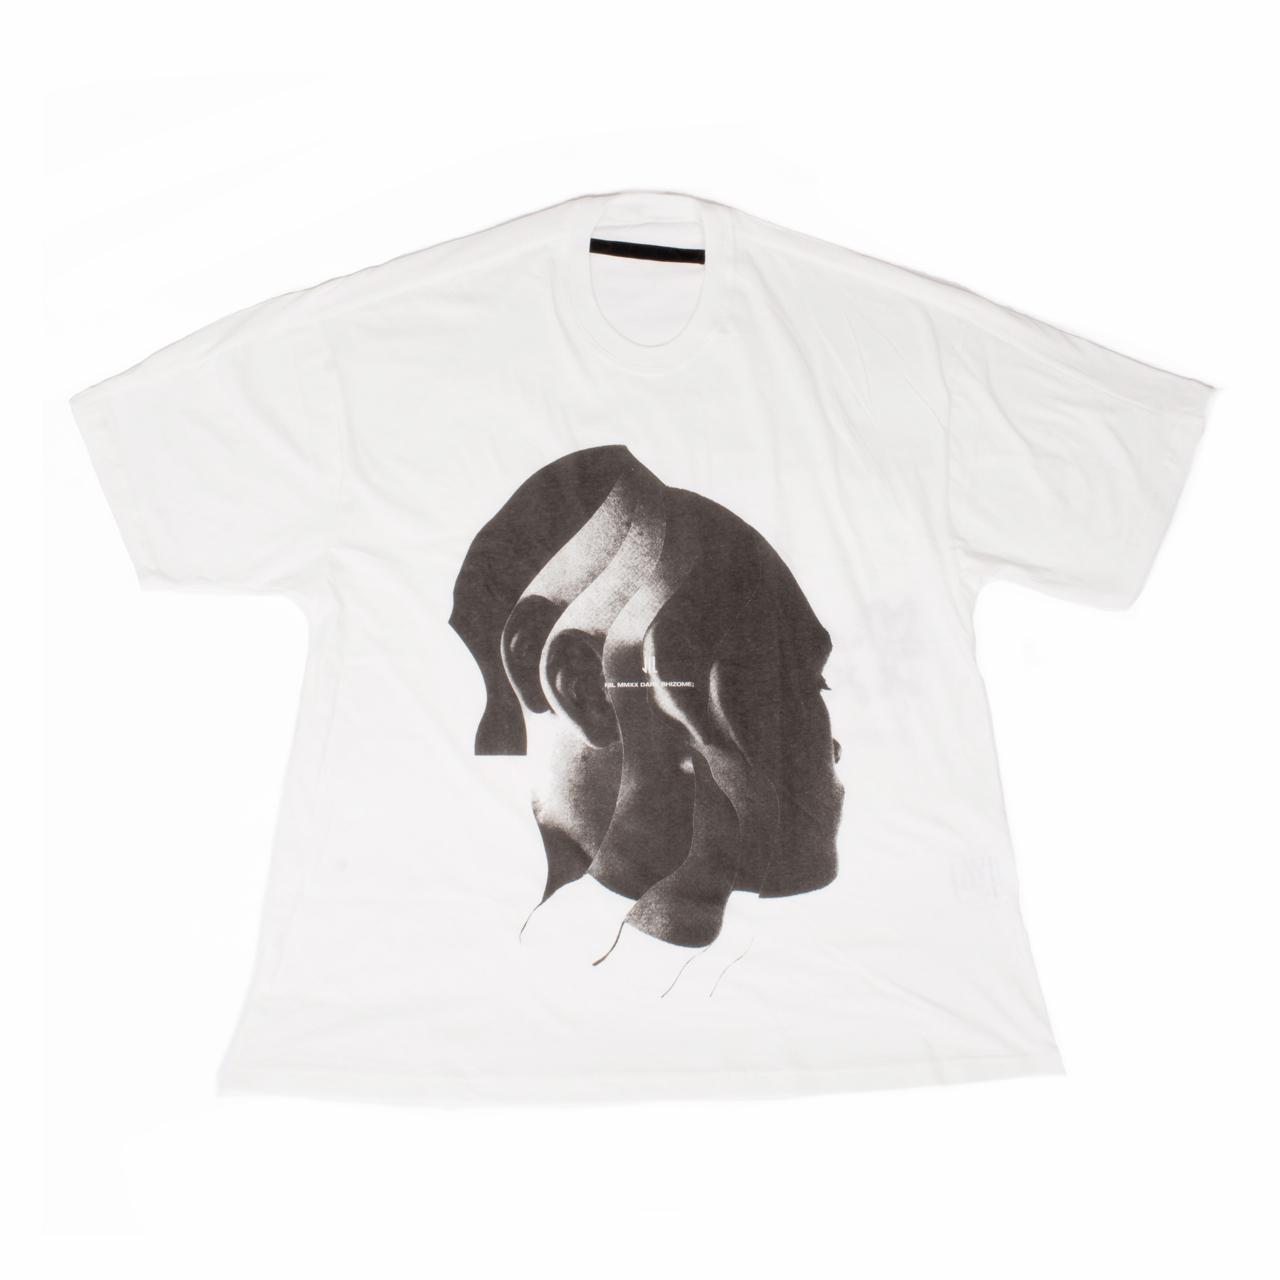 701CPM11-OFF / Jesse Draxler プリント Tシャツ ver.1